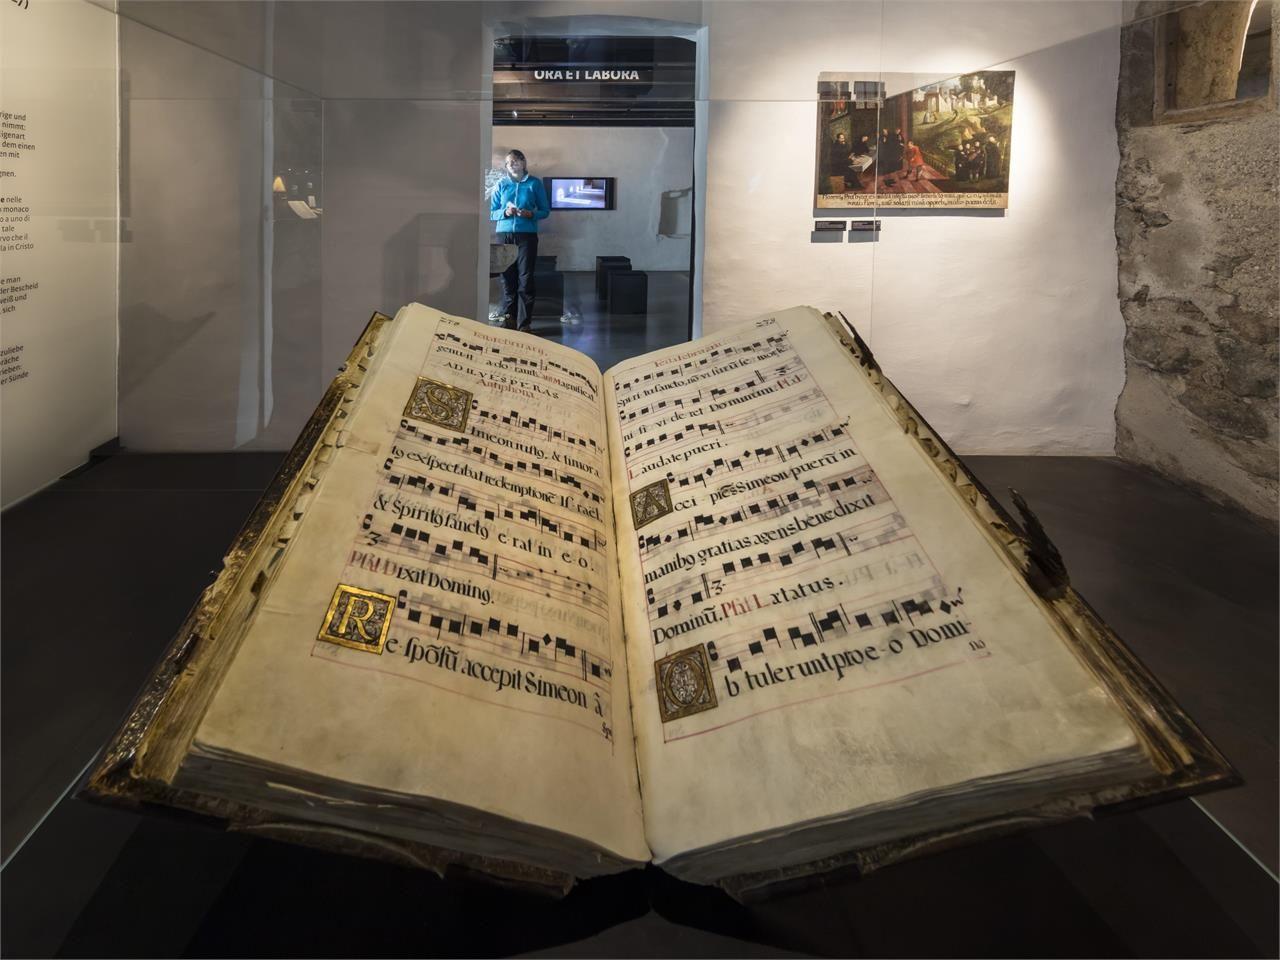 [Kloster Marienberg]